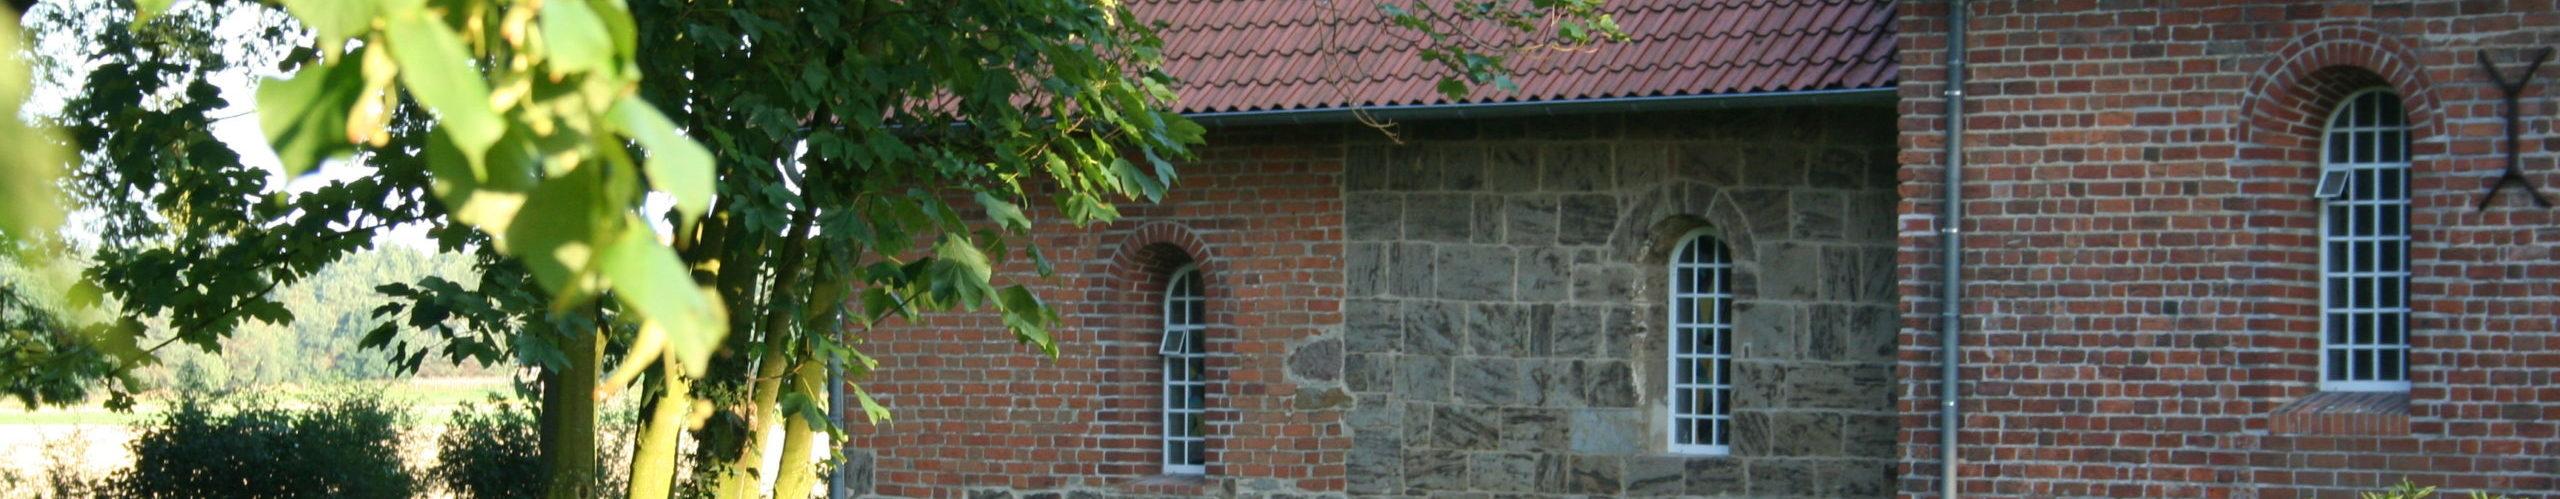 Posaunenchor Hassel/Weser